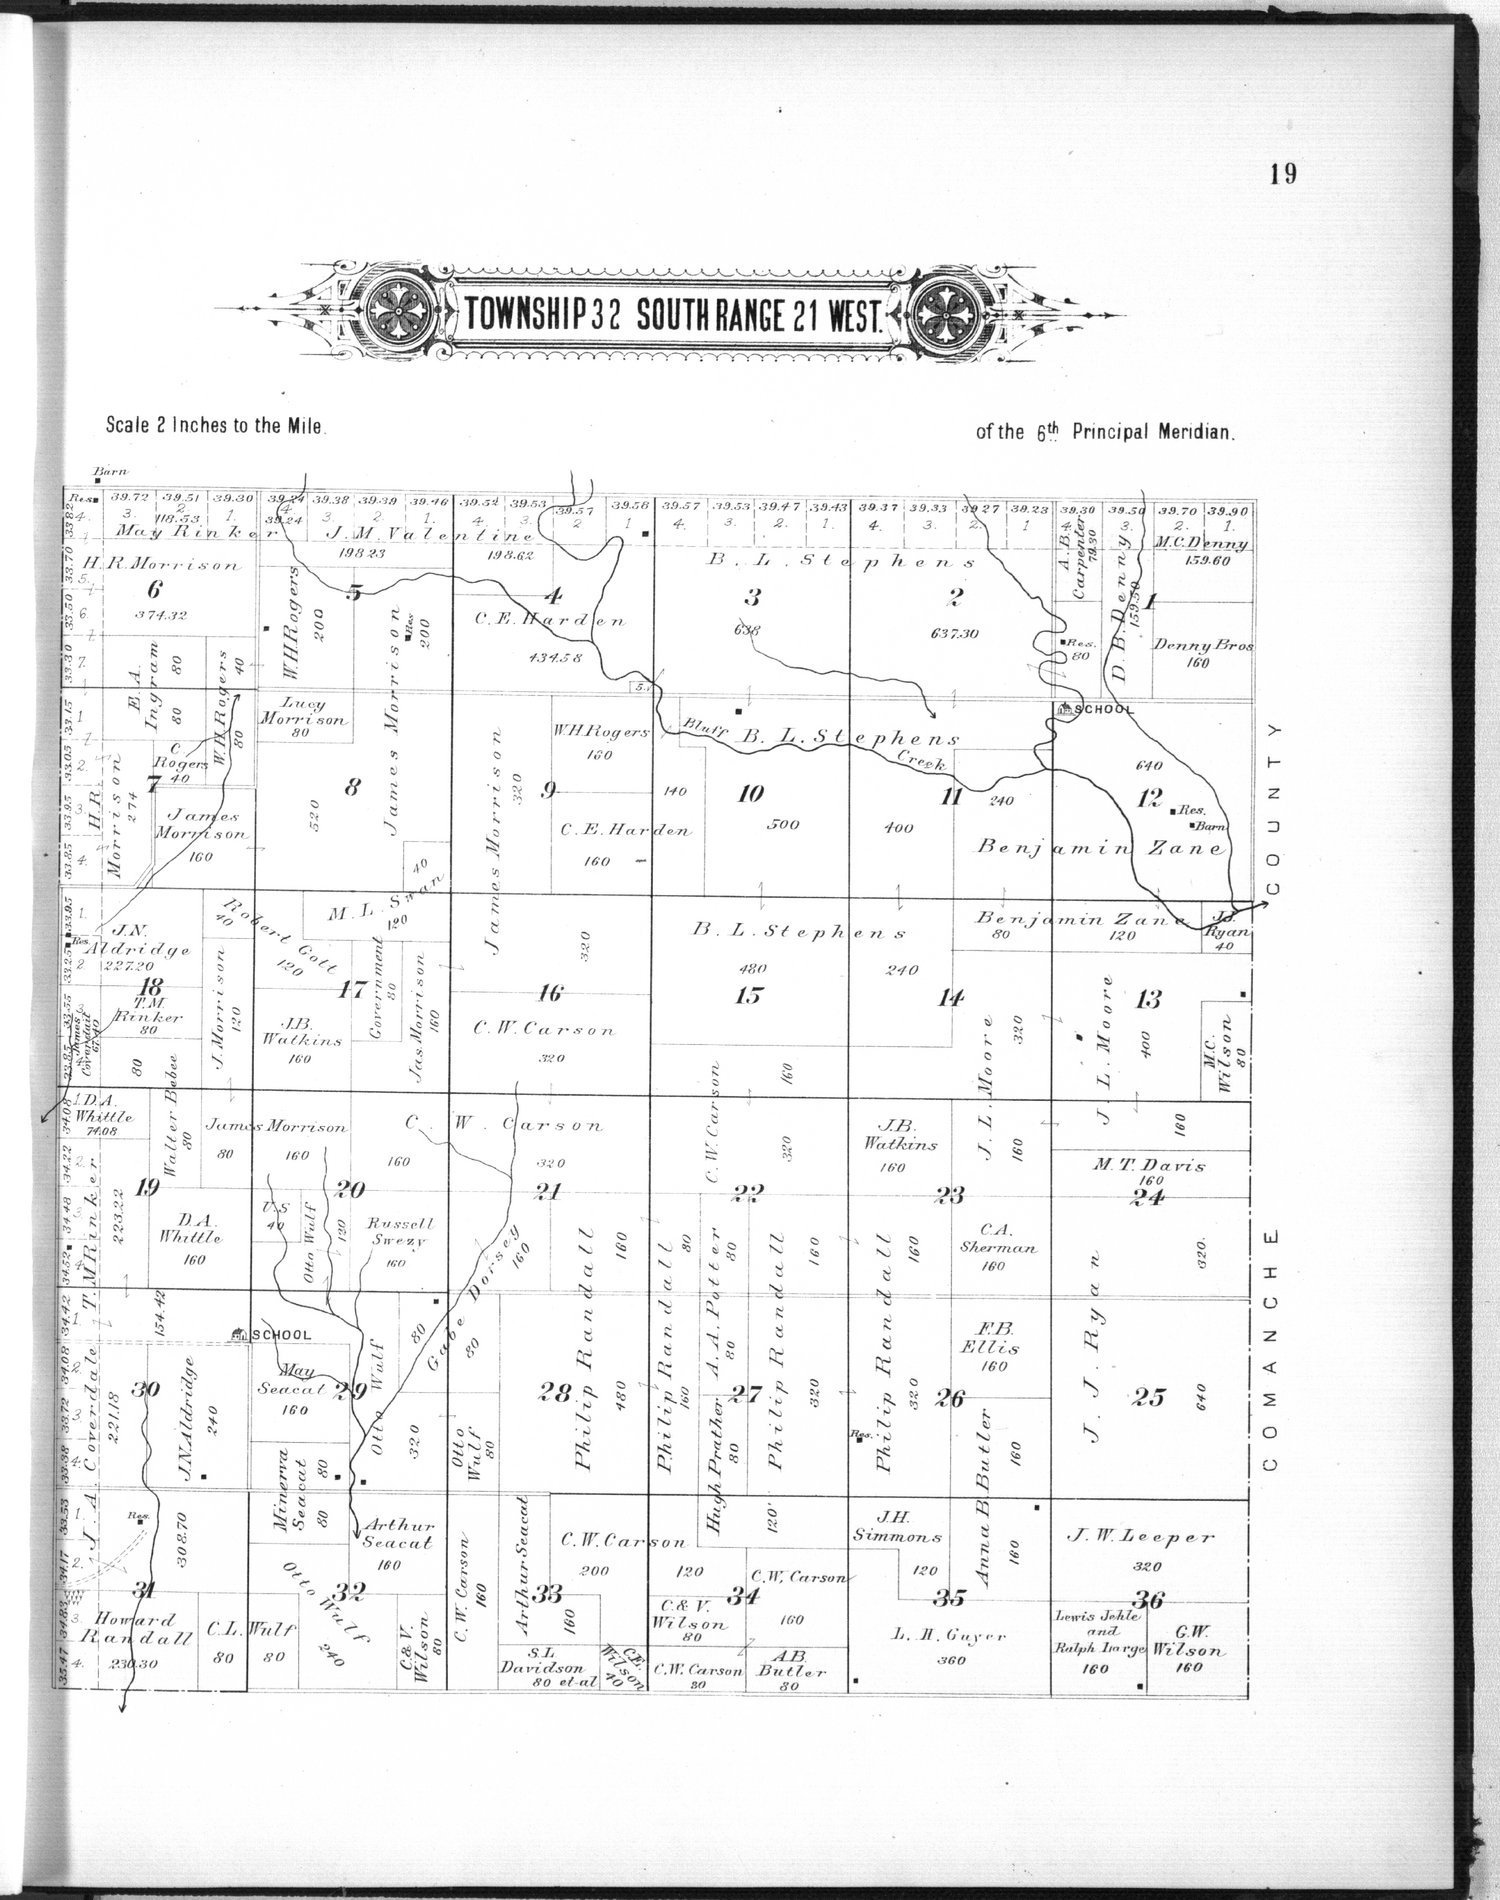 Plat book of Clark County, Kansas - 19